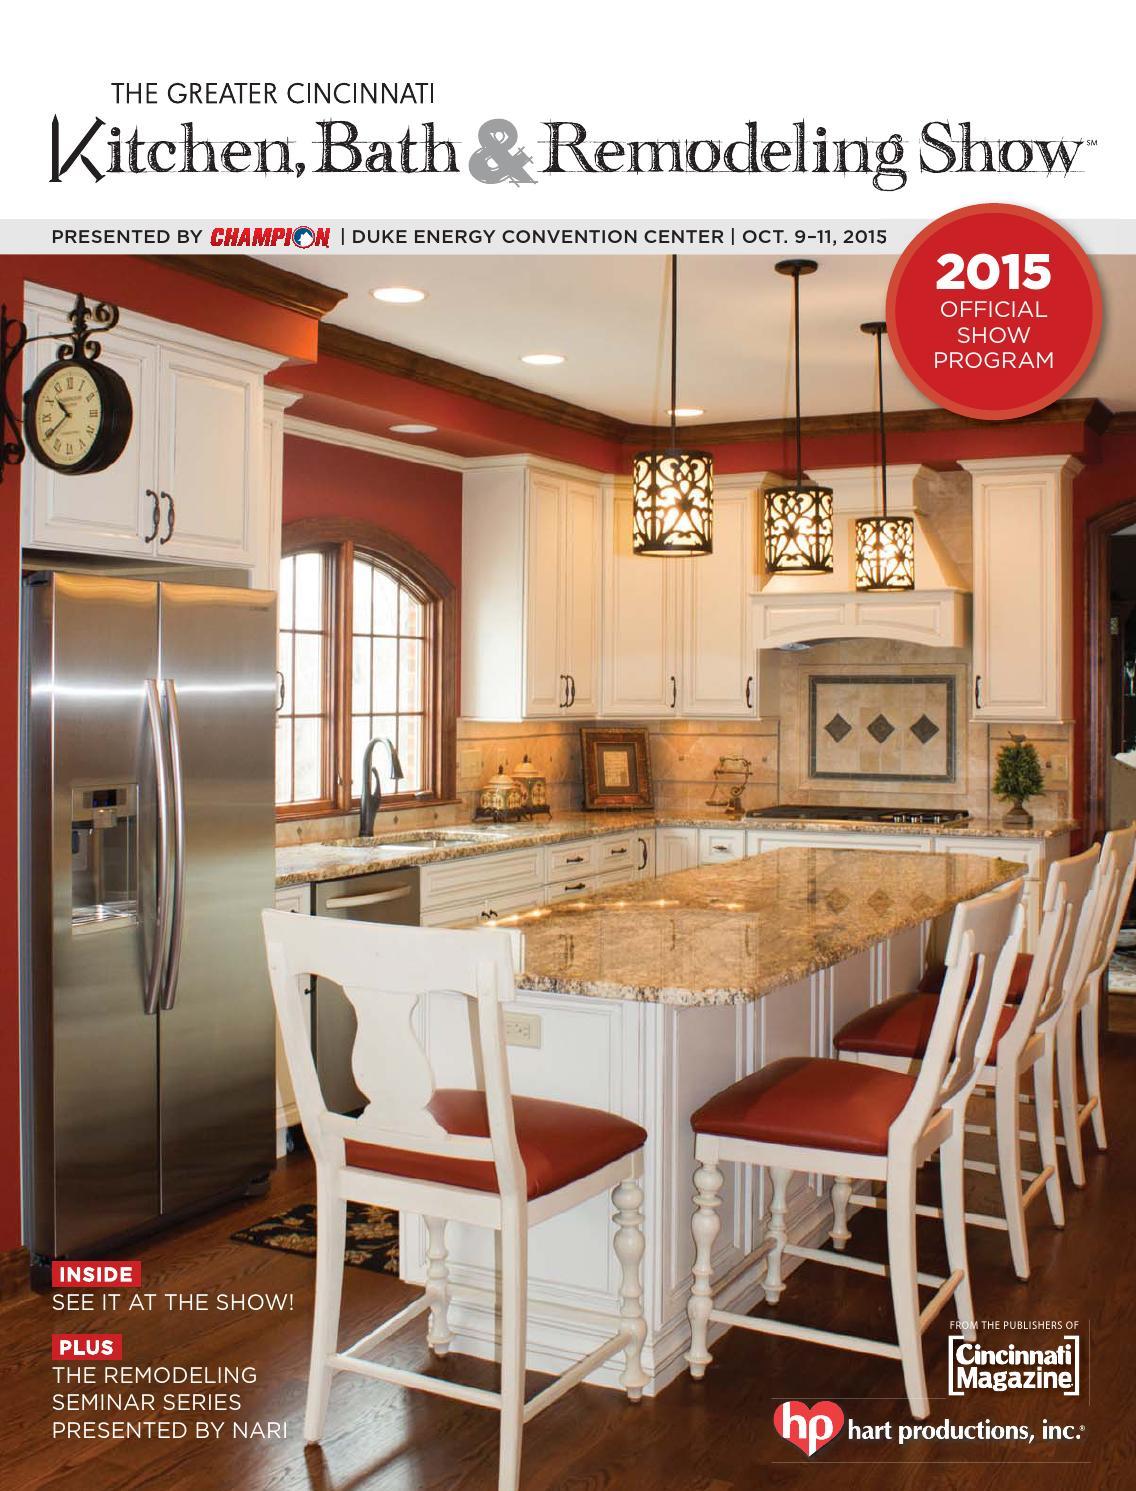 Amazing The Greater Cincinnati Kitchen, Bath U0026 Remodeling Show Program 2015 By  Cincinnati Magazine   Issuu